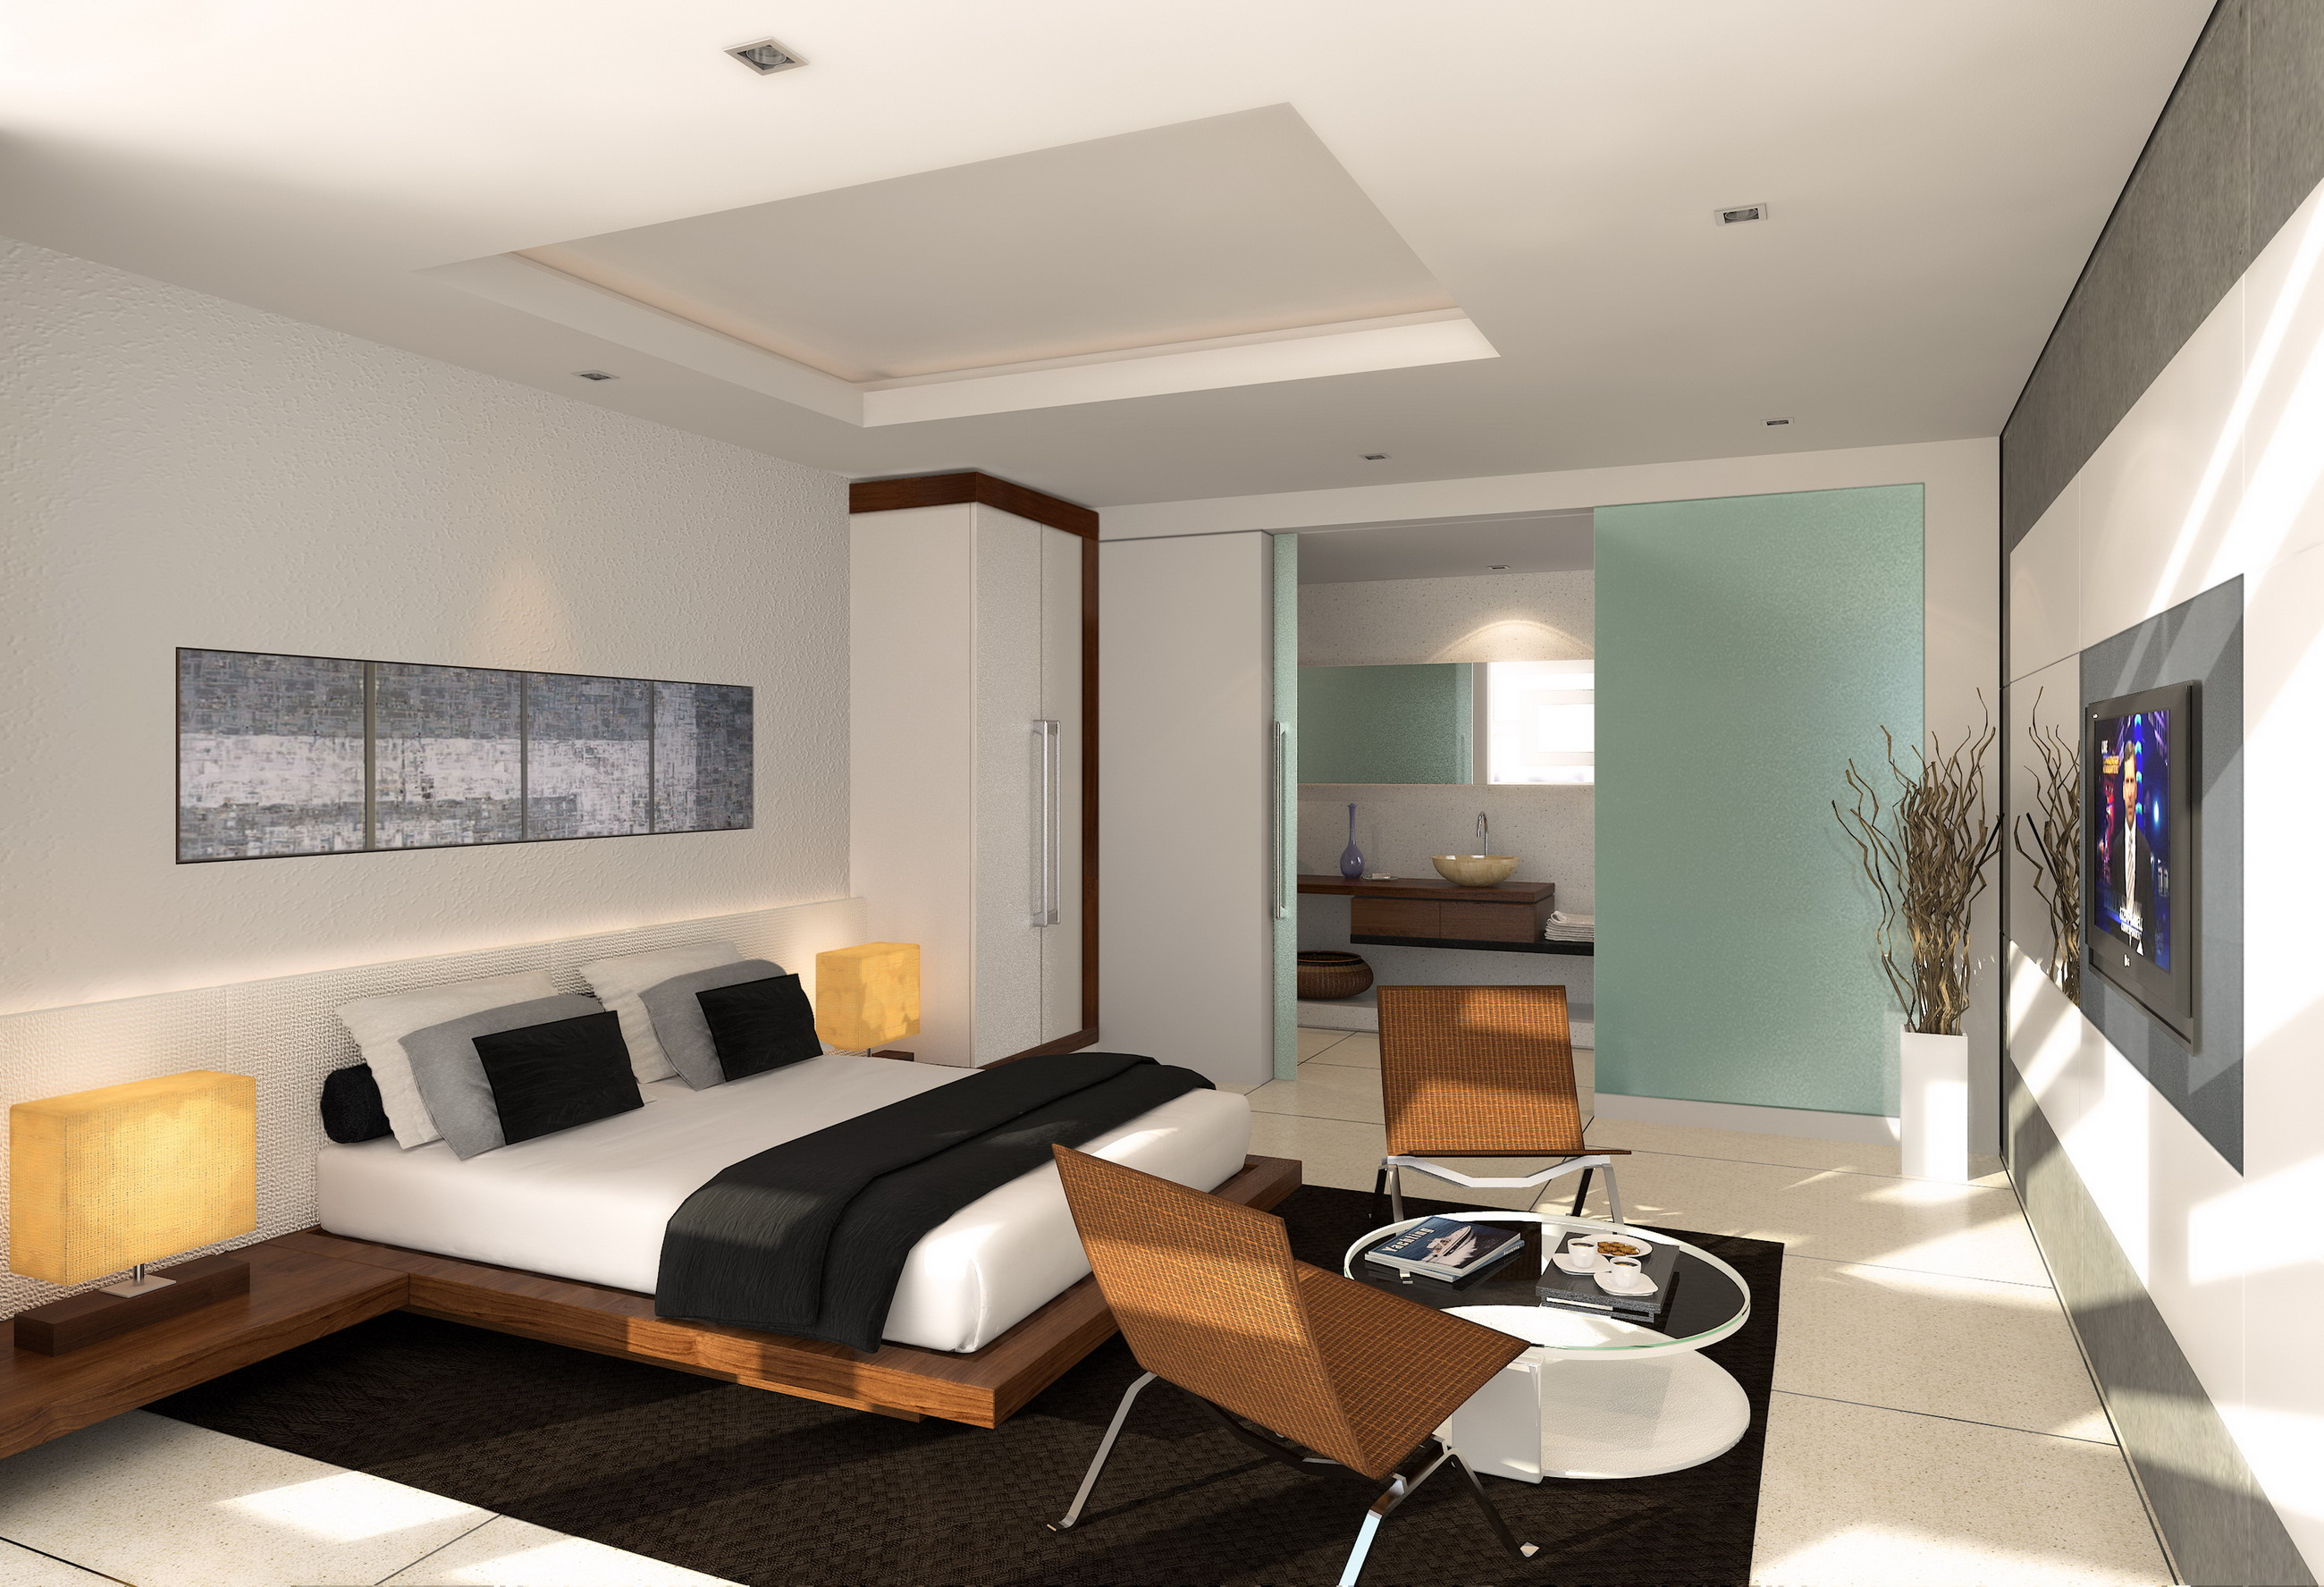 Idea Dekorasi Bilik Tidur Master Dengan Konsep Kontemporari Moden Susunan Perabot Yang Minima